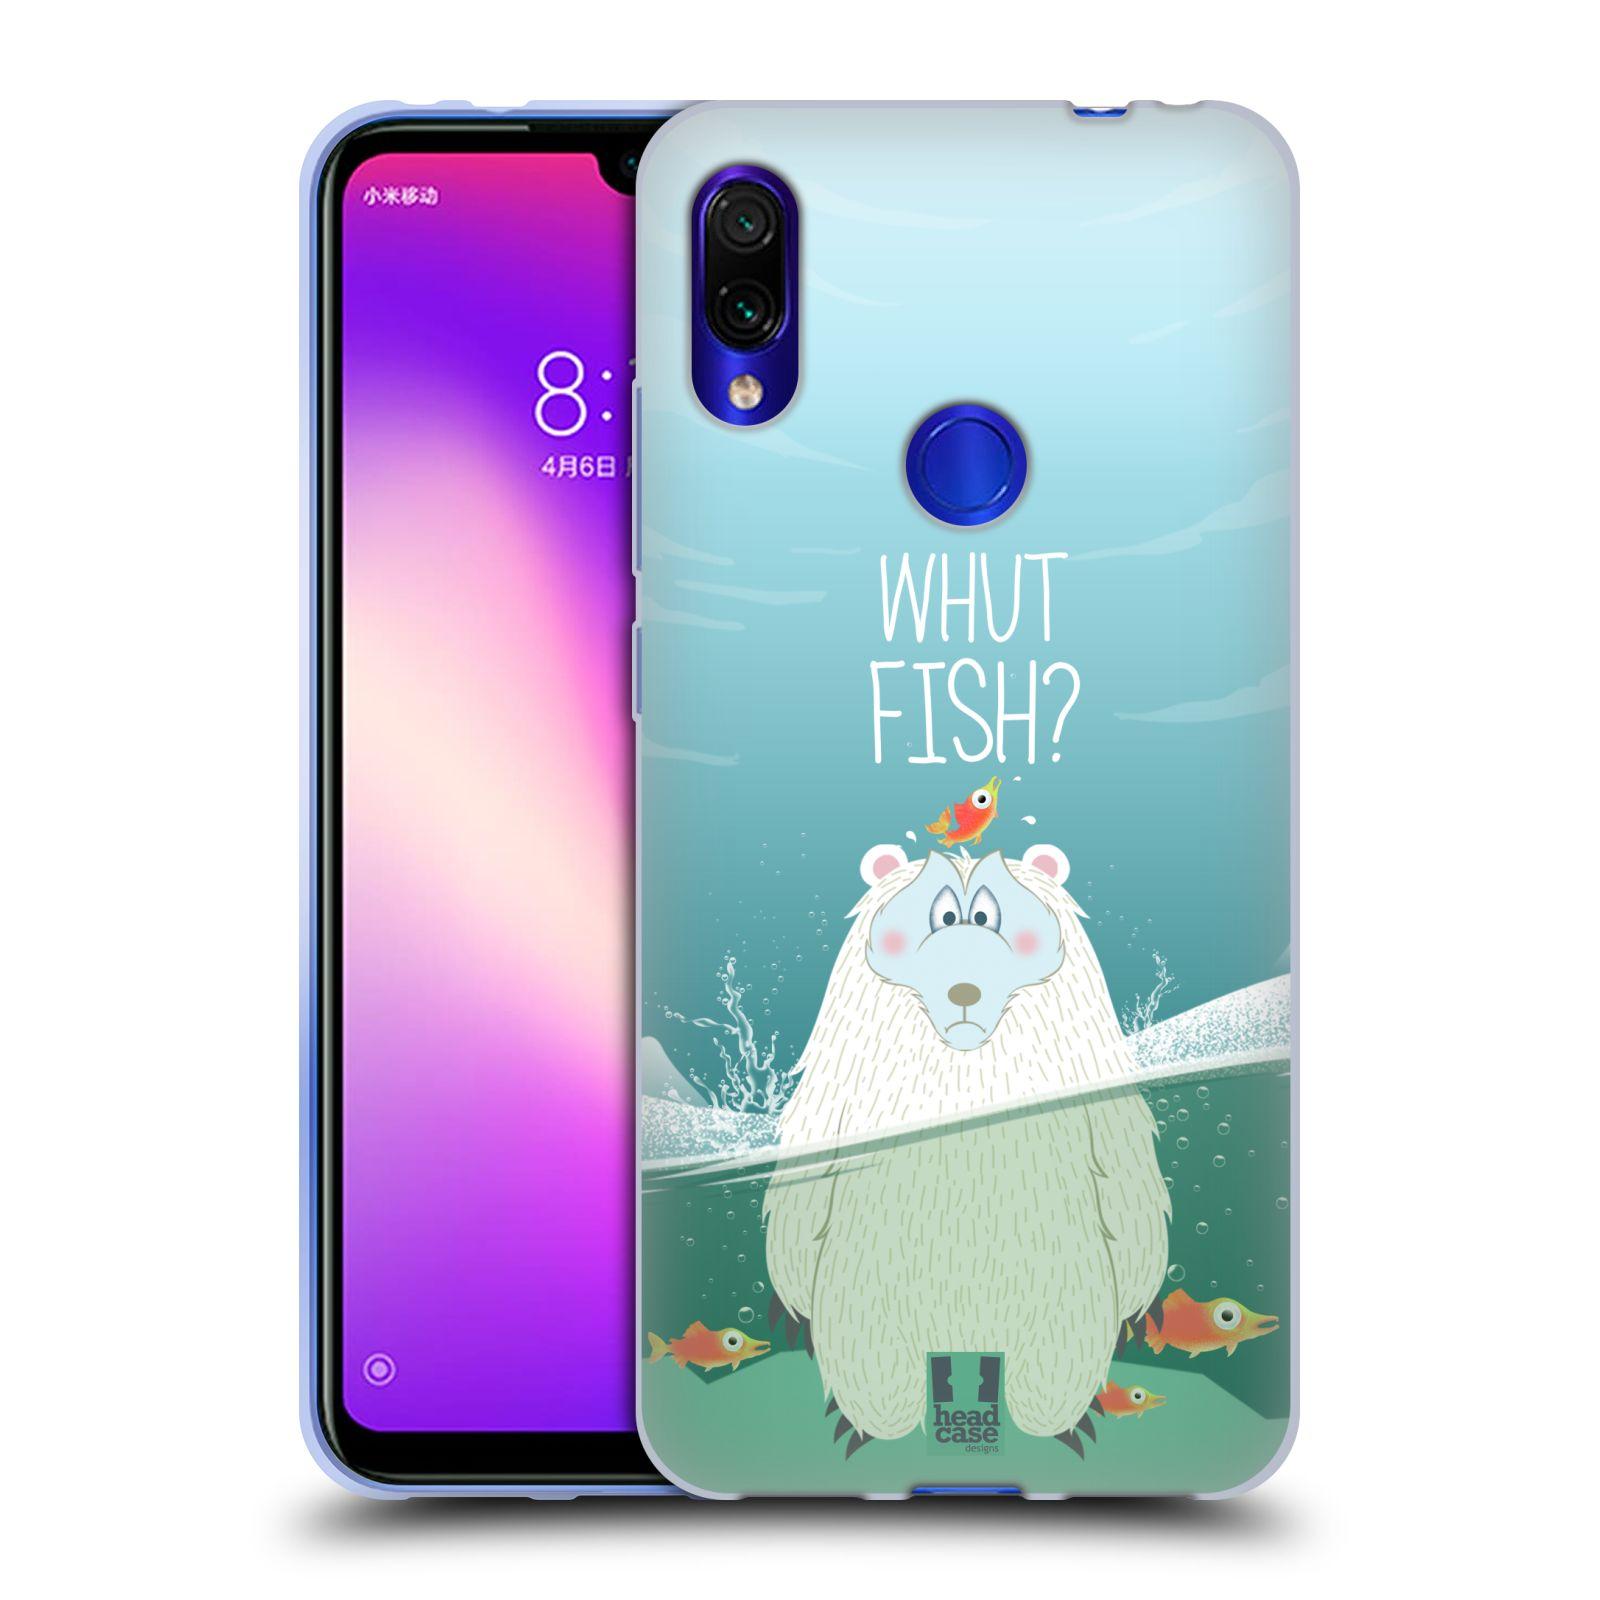 Silikonové pouzdro na mobil Xiaomi Redmi Note 7 - Head Case - Medvěd Whut Fish?